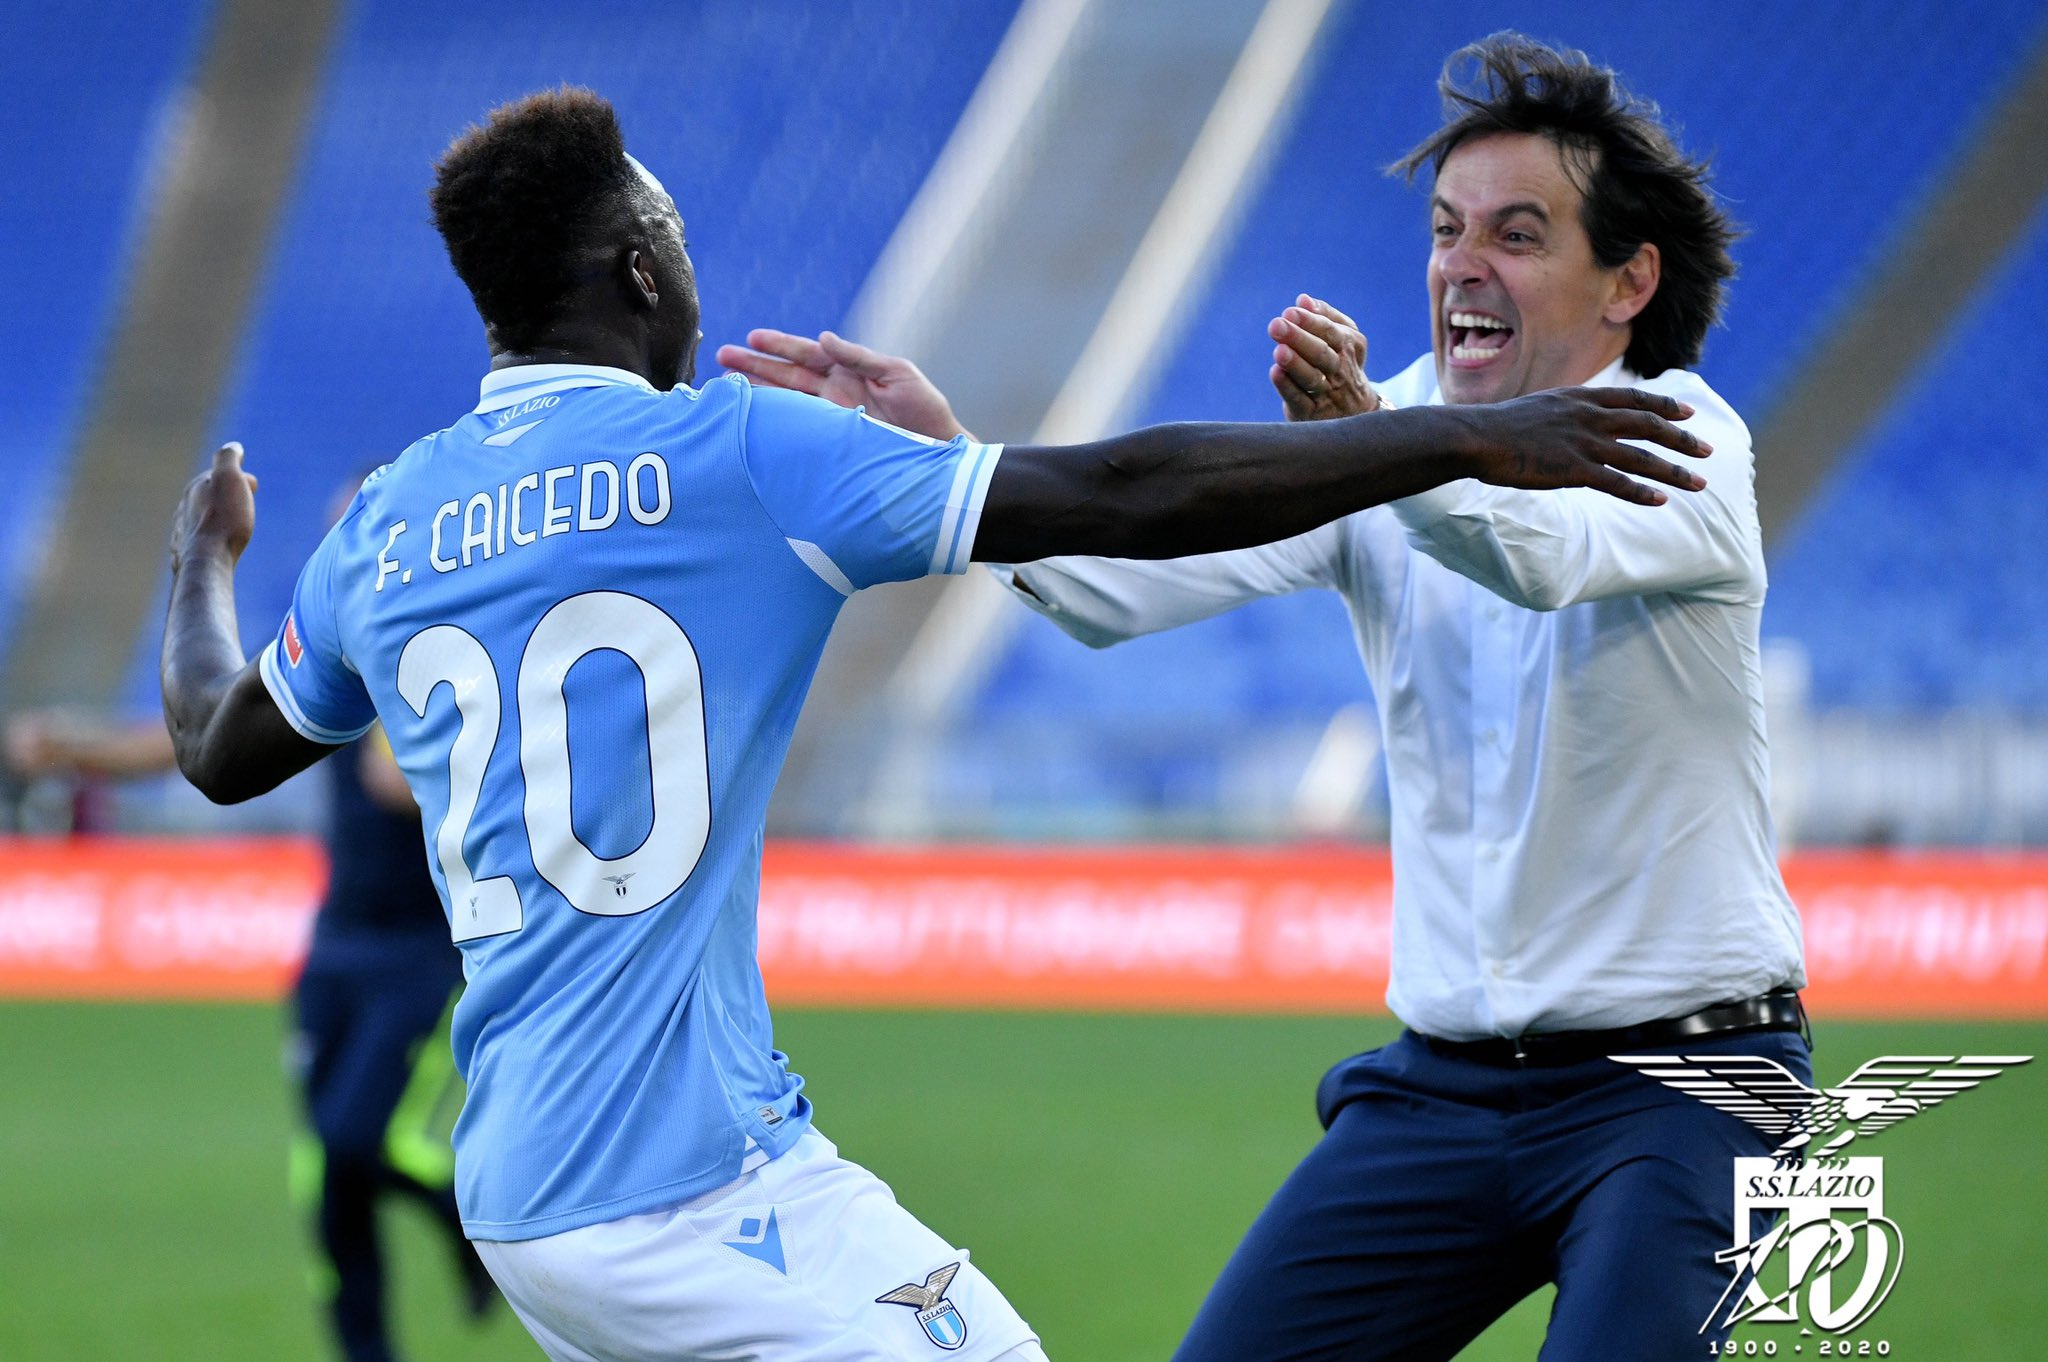 El ecuatoriano volvió a ser protagonistas en la Serie A de Italia